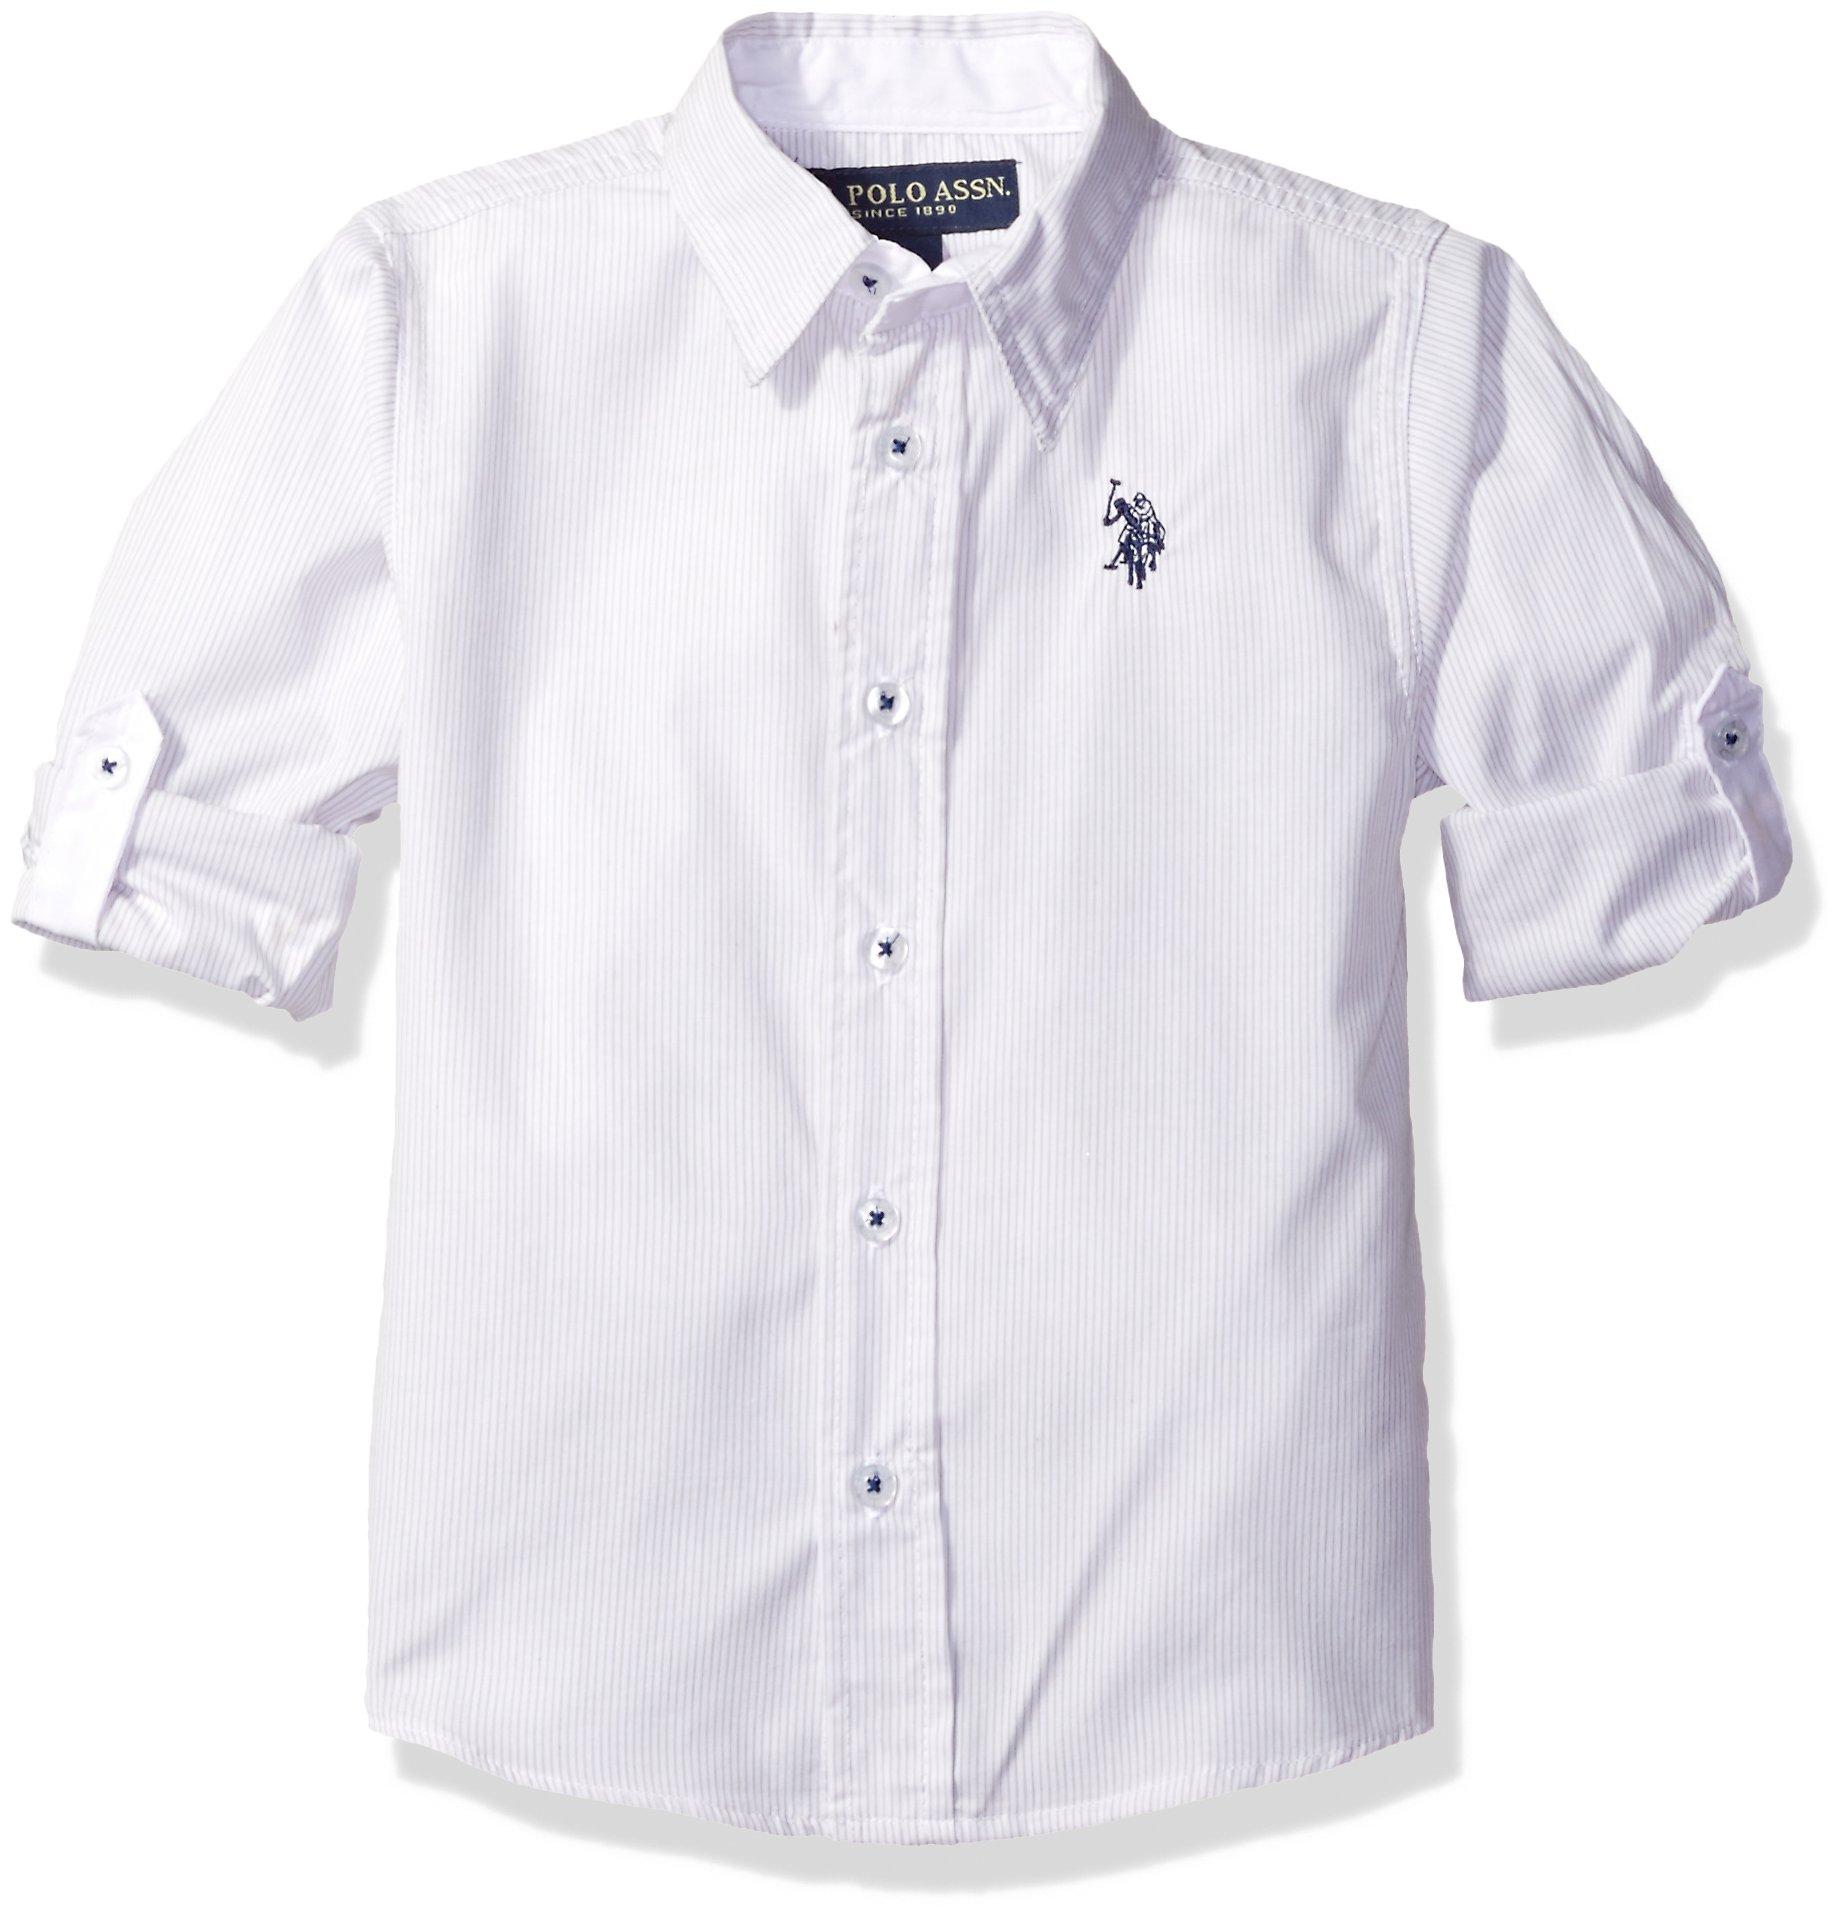 U.S. Polo Assn. Boys' Long Sleeve Striped Cotton Sport Shirt